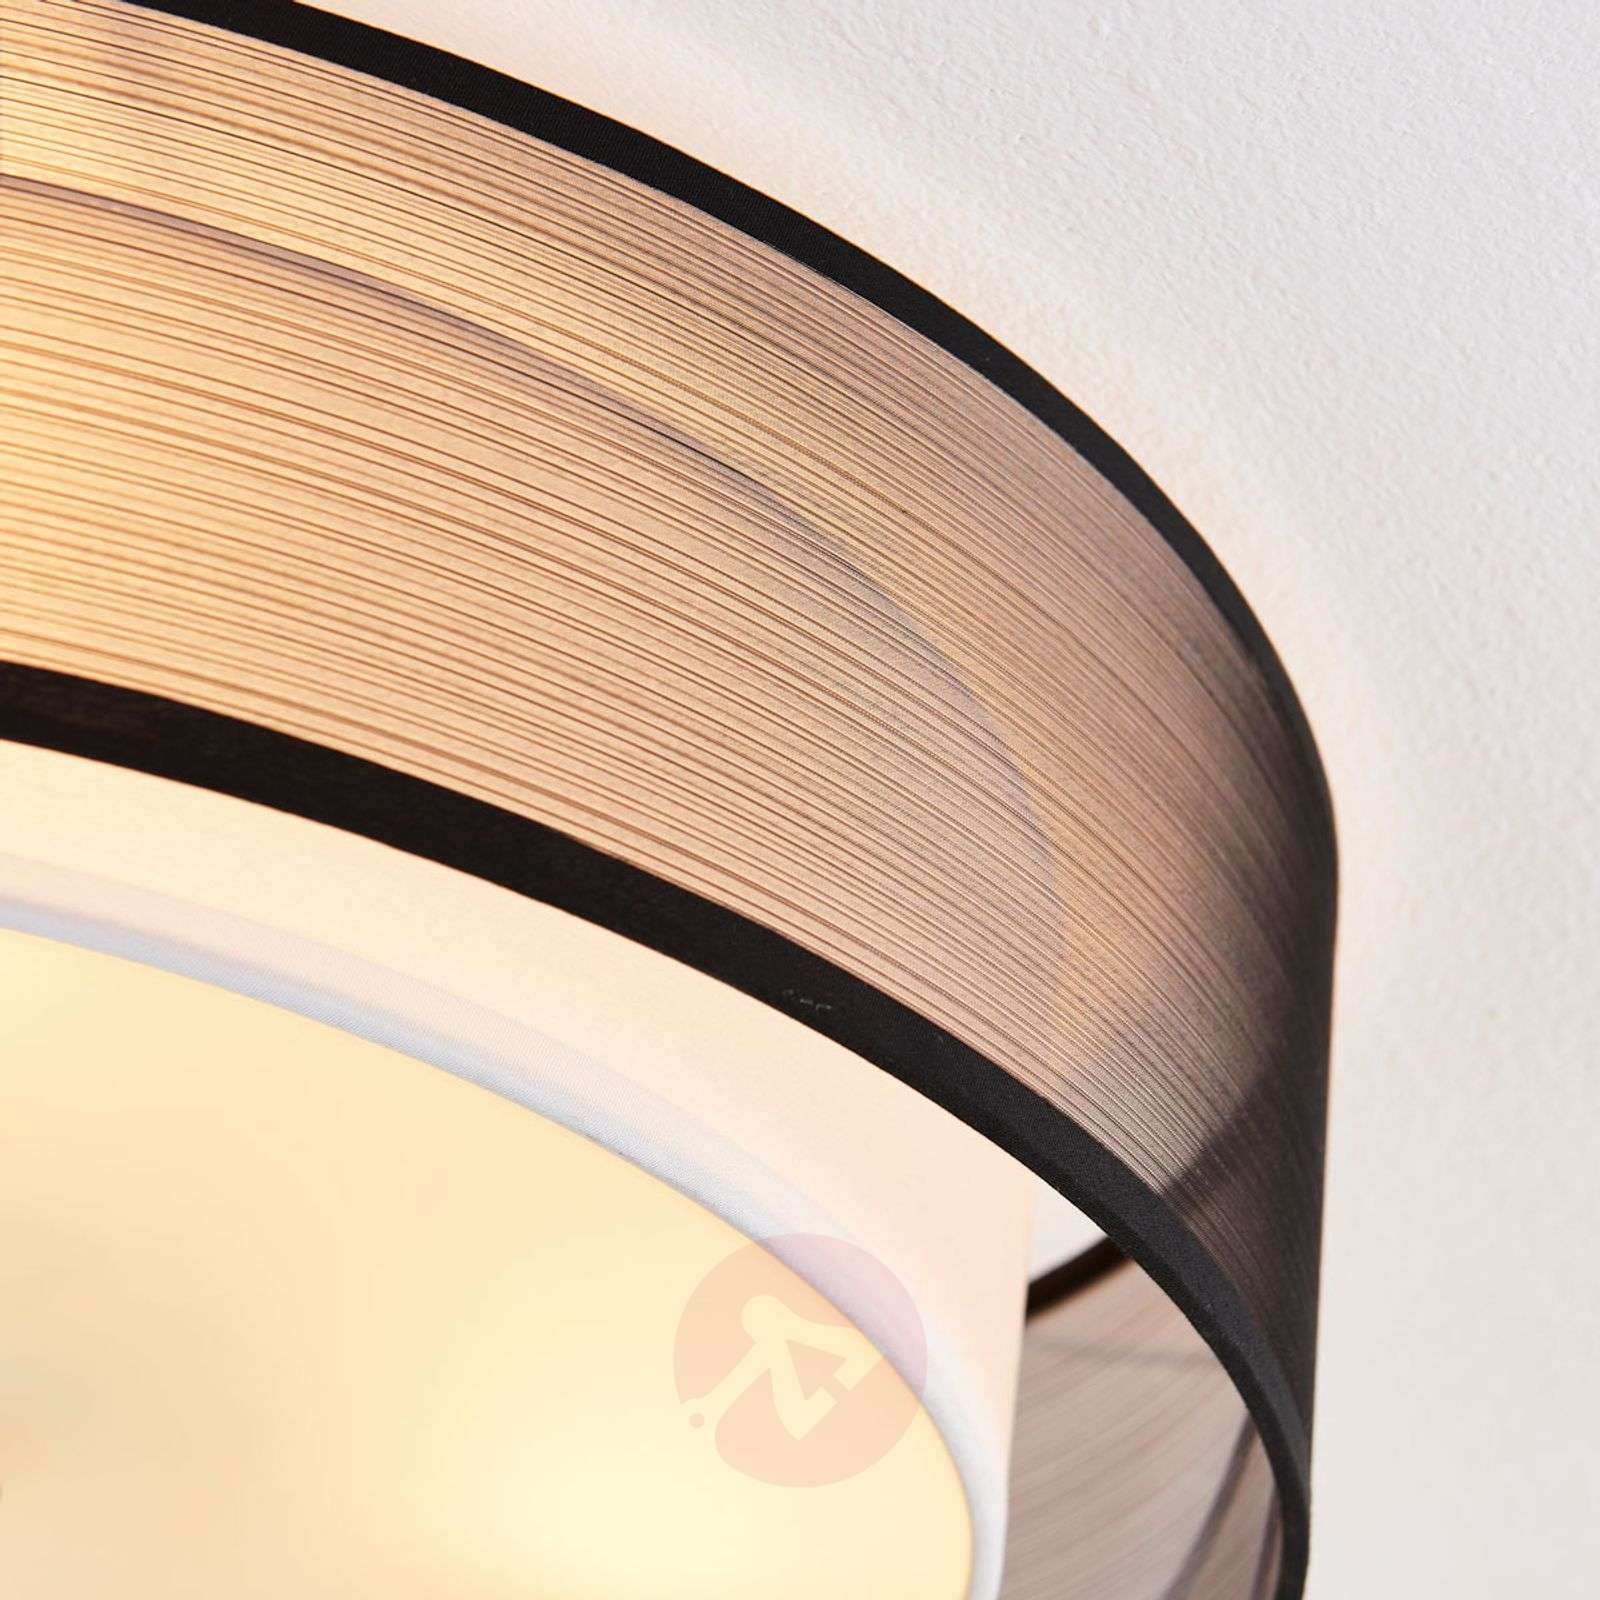 Easydim-LED-kattovalaisin Tobia, organza-varjostin-9621304-02